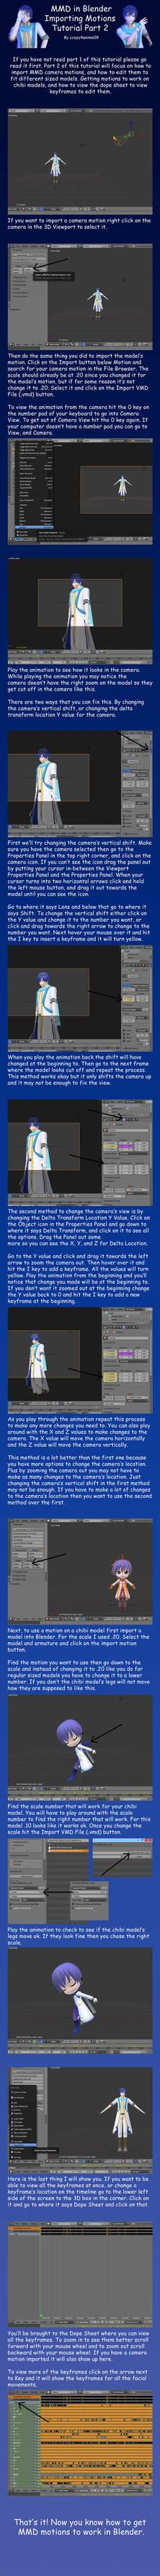 MMD in Blender 2.79 Importing Motions Tutorial 2